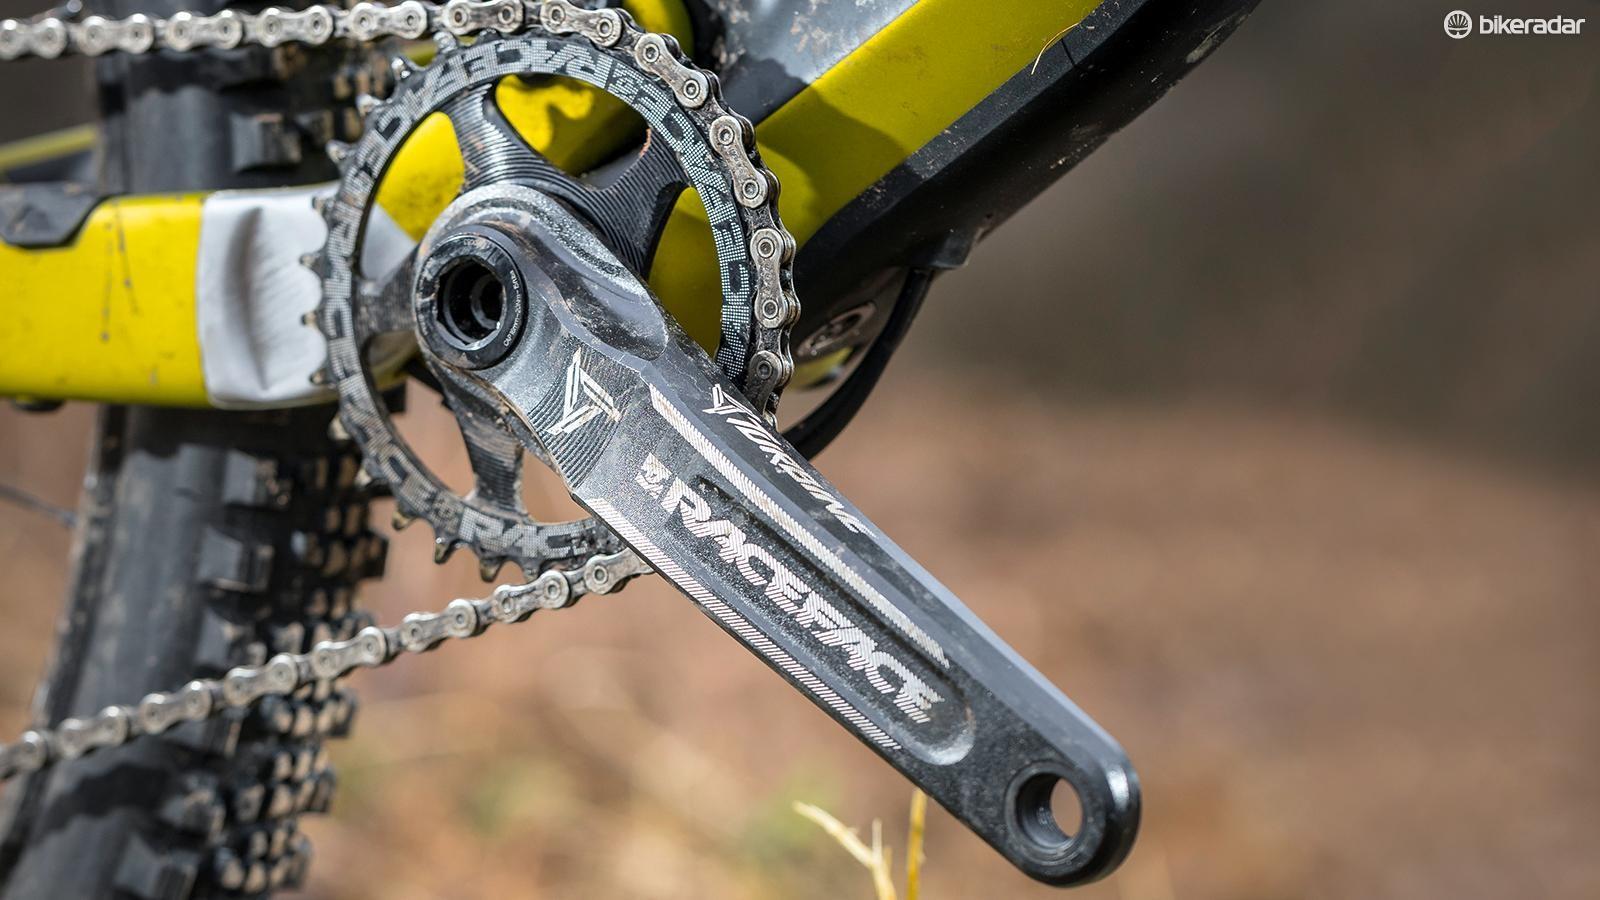 The bike has a RaceFace Turbine 30t crankset